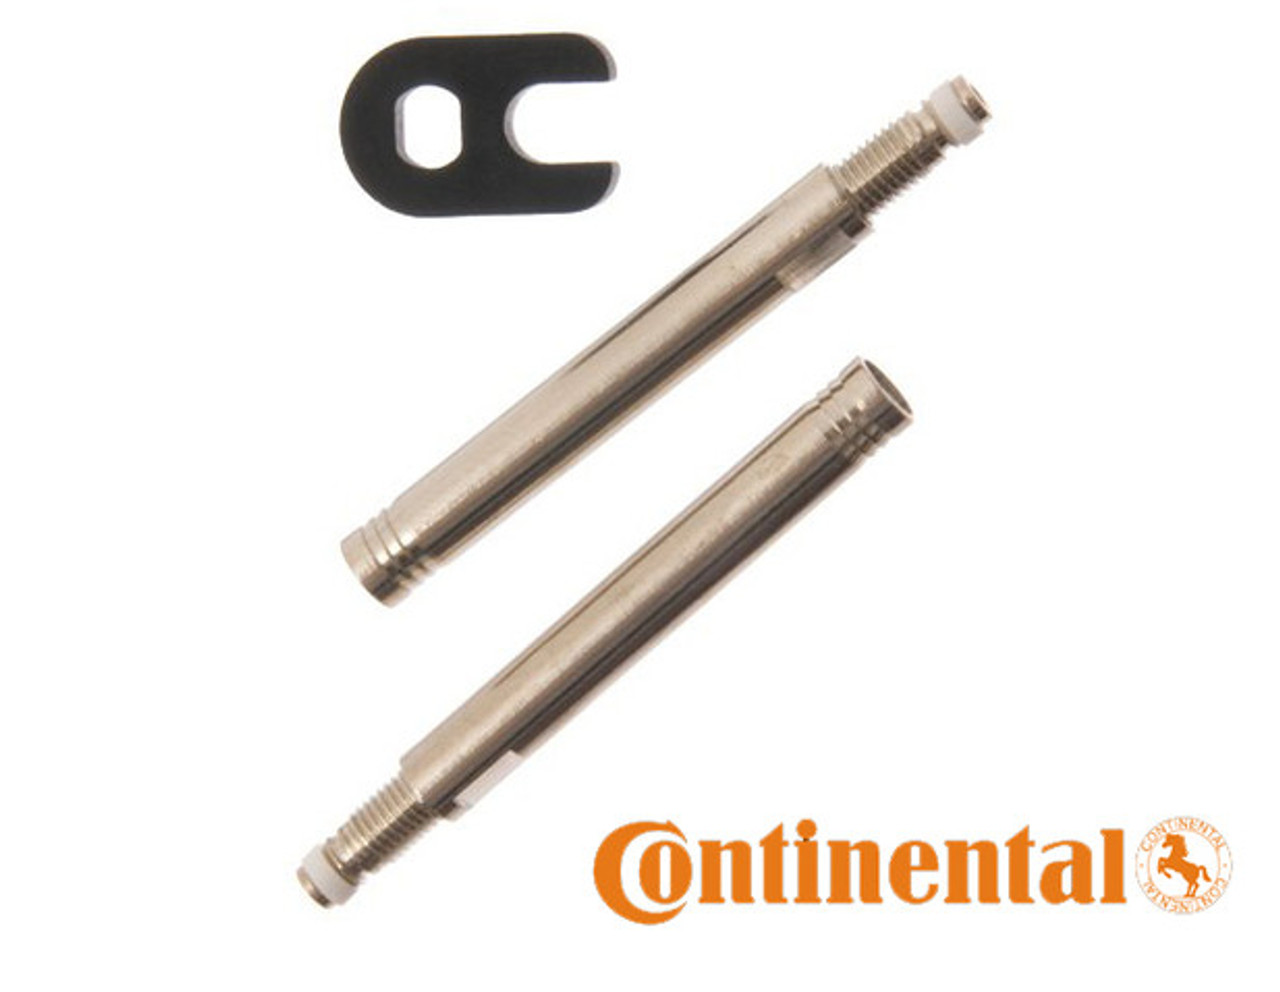 Continental Valve Extensions 30mm Presta x 2